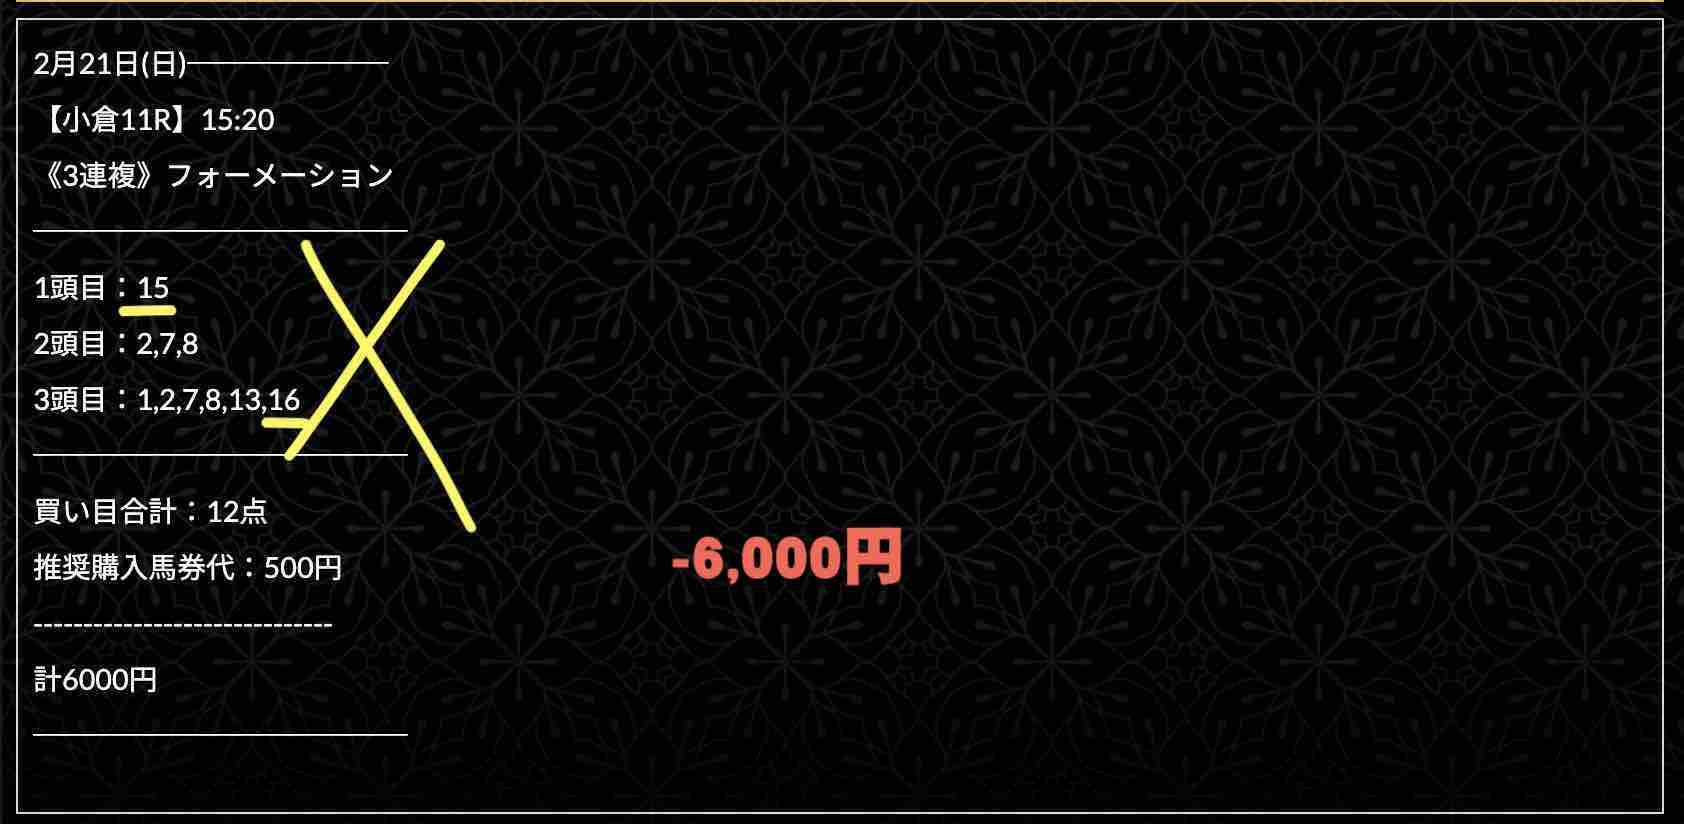 EXTRA(エクストラ)の無料予想(無料情報)の抜き打ち検証_小倉11R